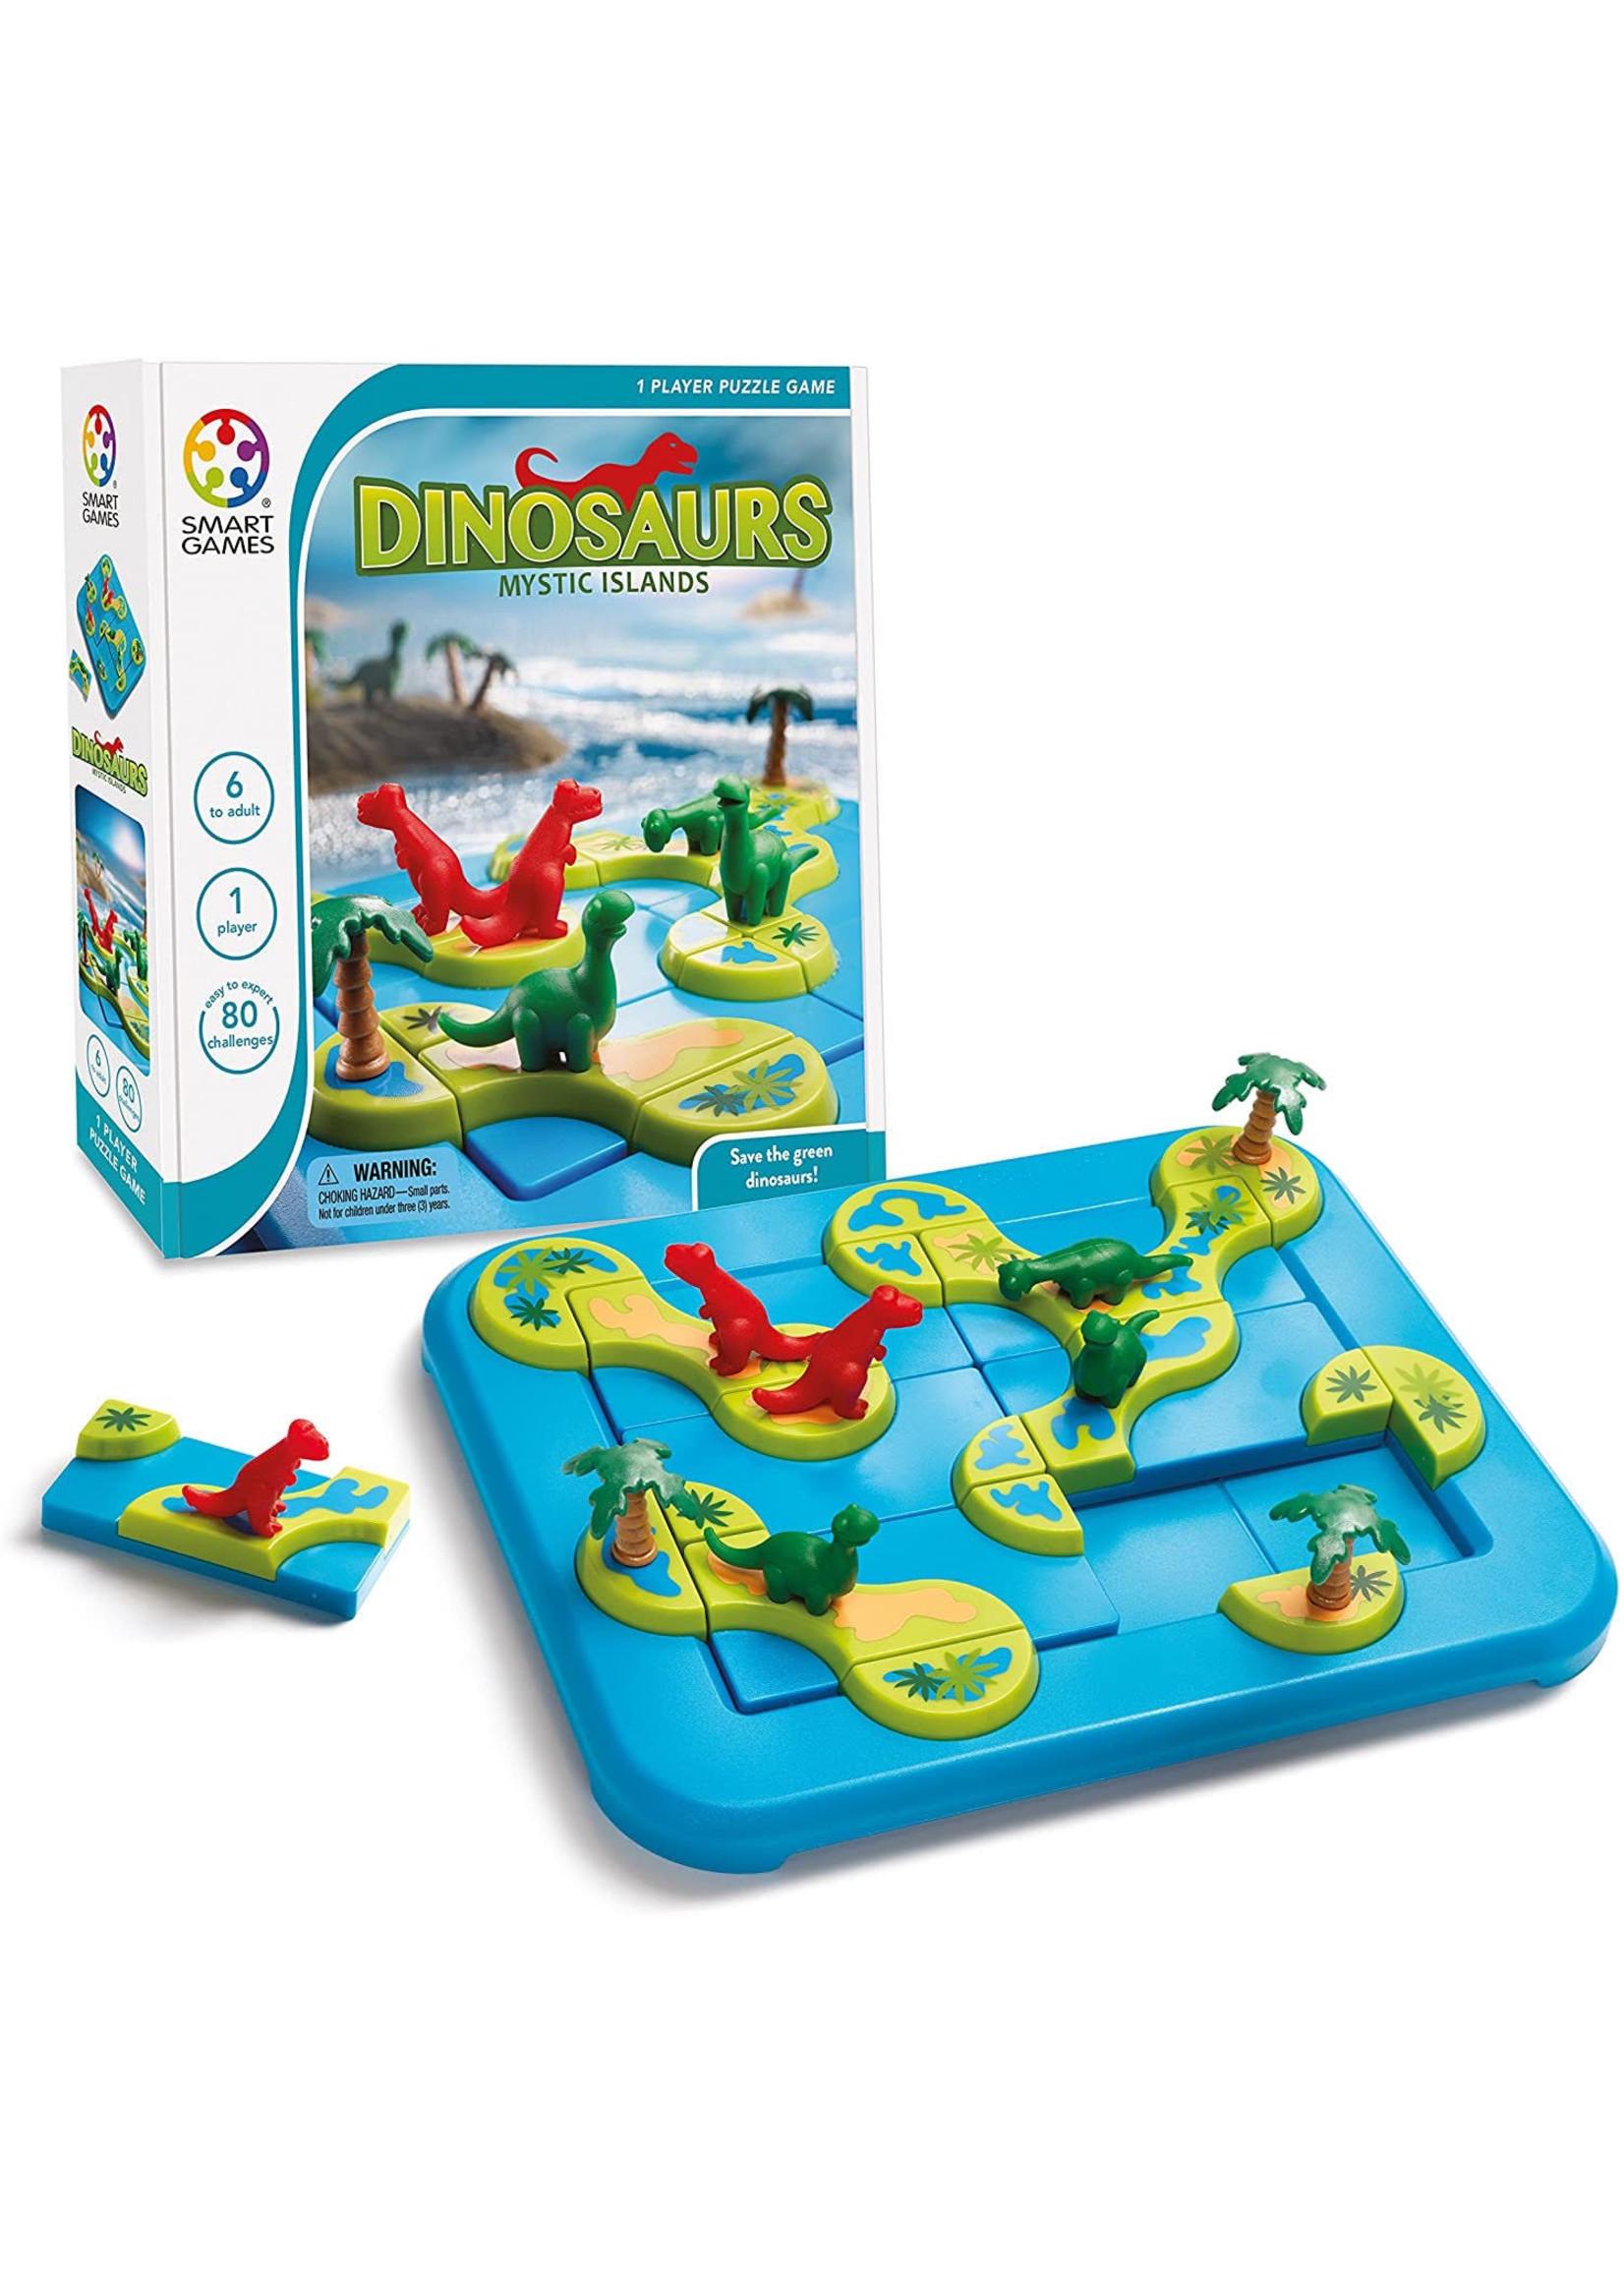 Smart Games Smart Games Dinosaurs Mystic Islands